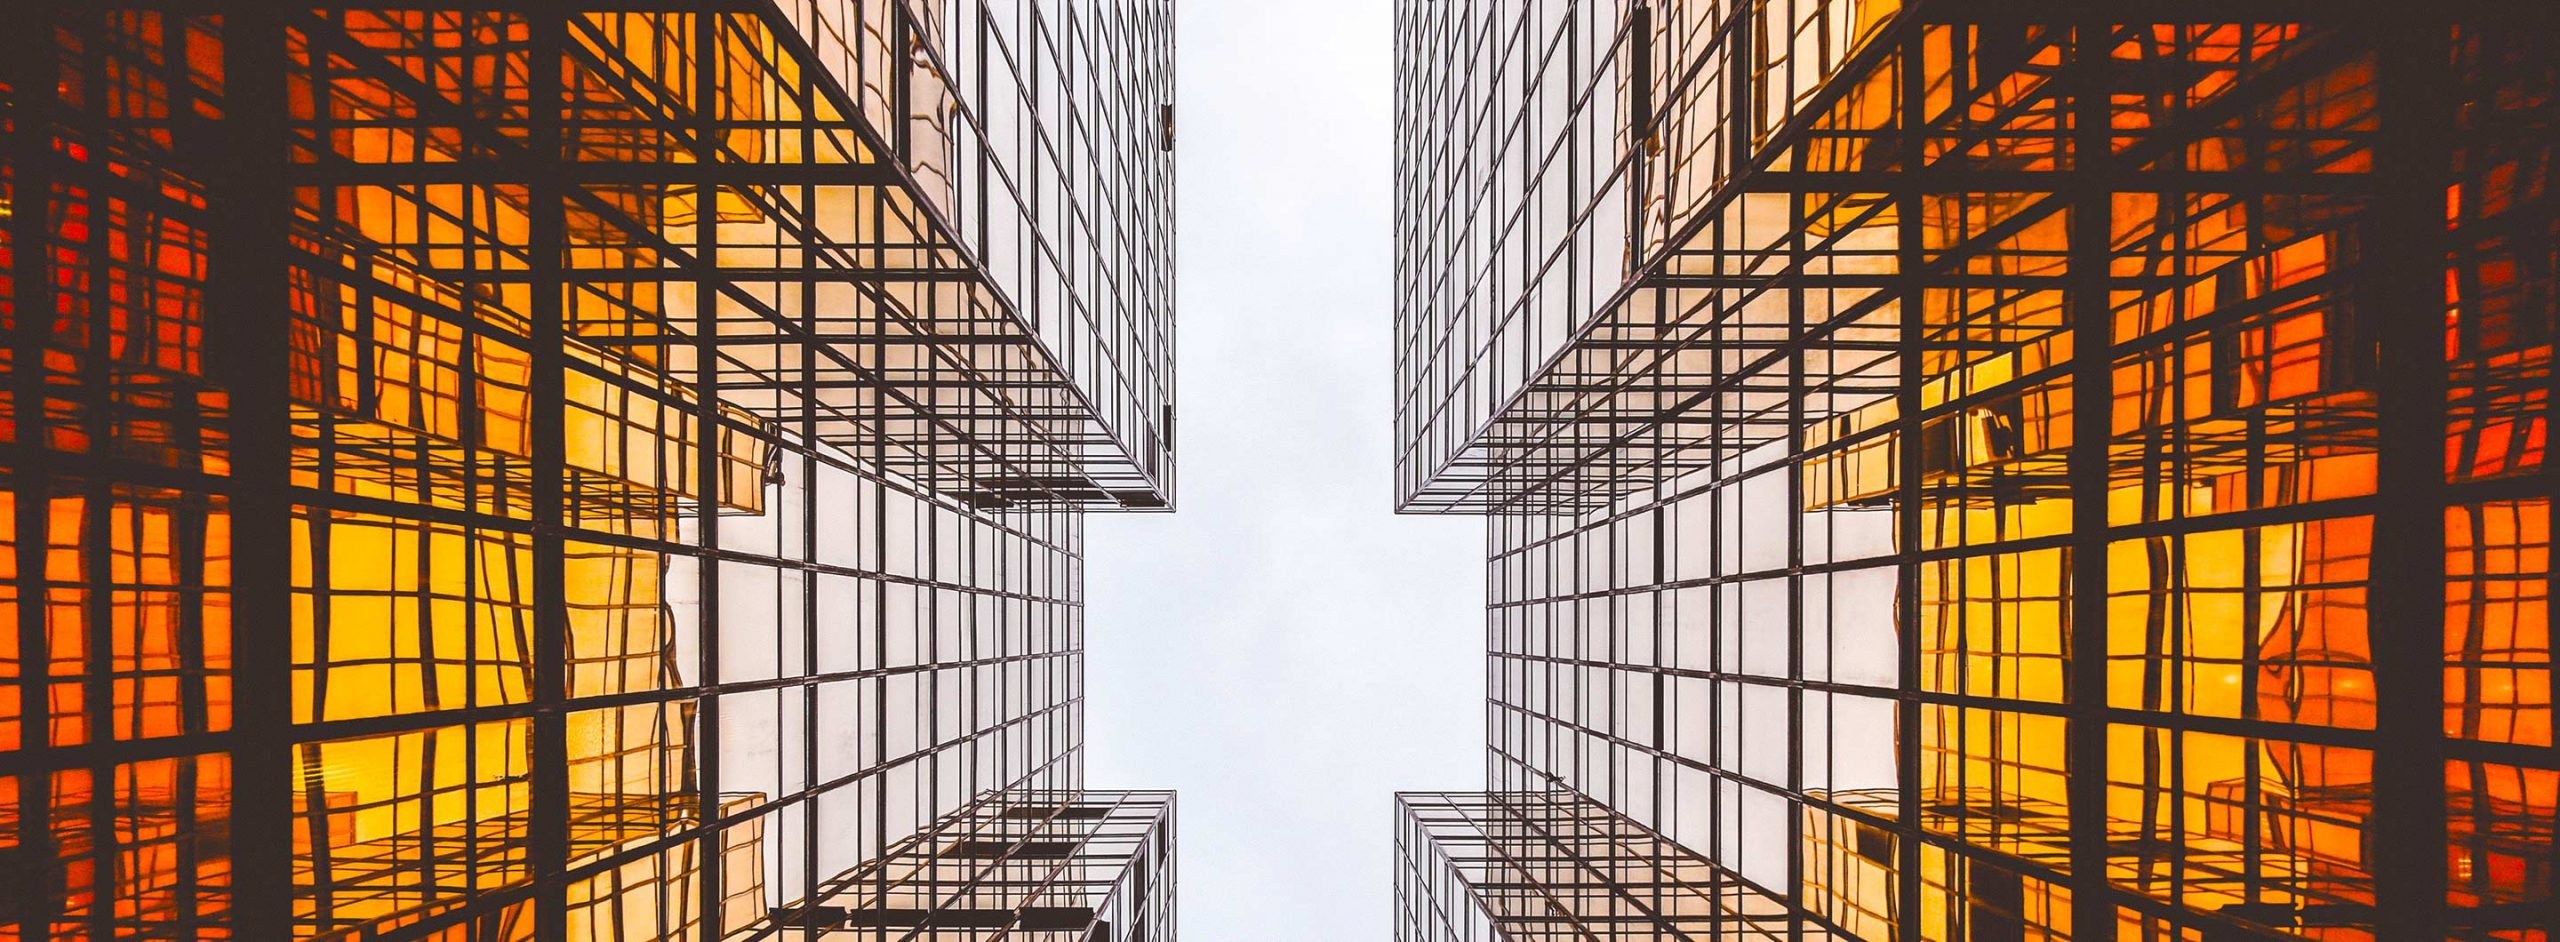 Closing-the Industry 4.0 Gap